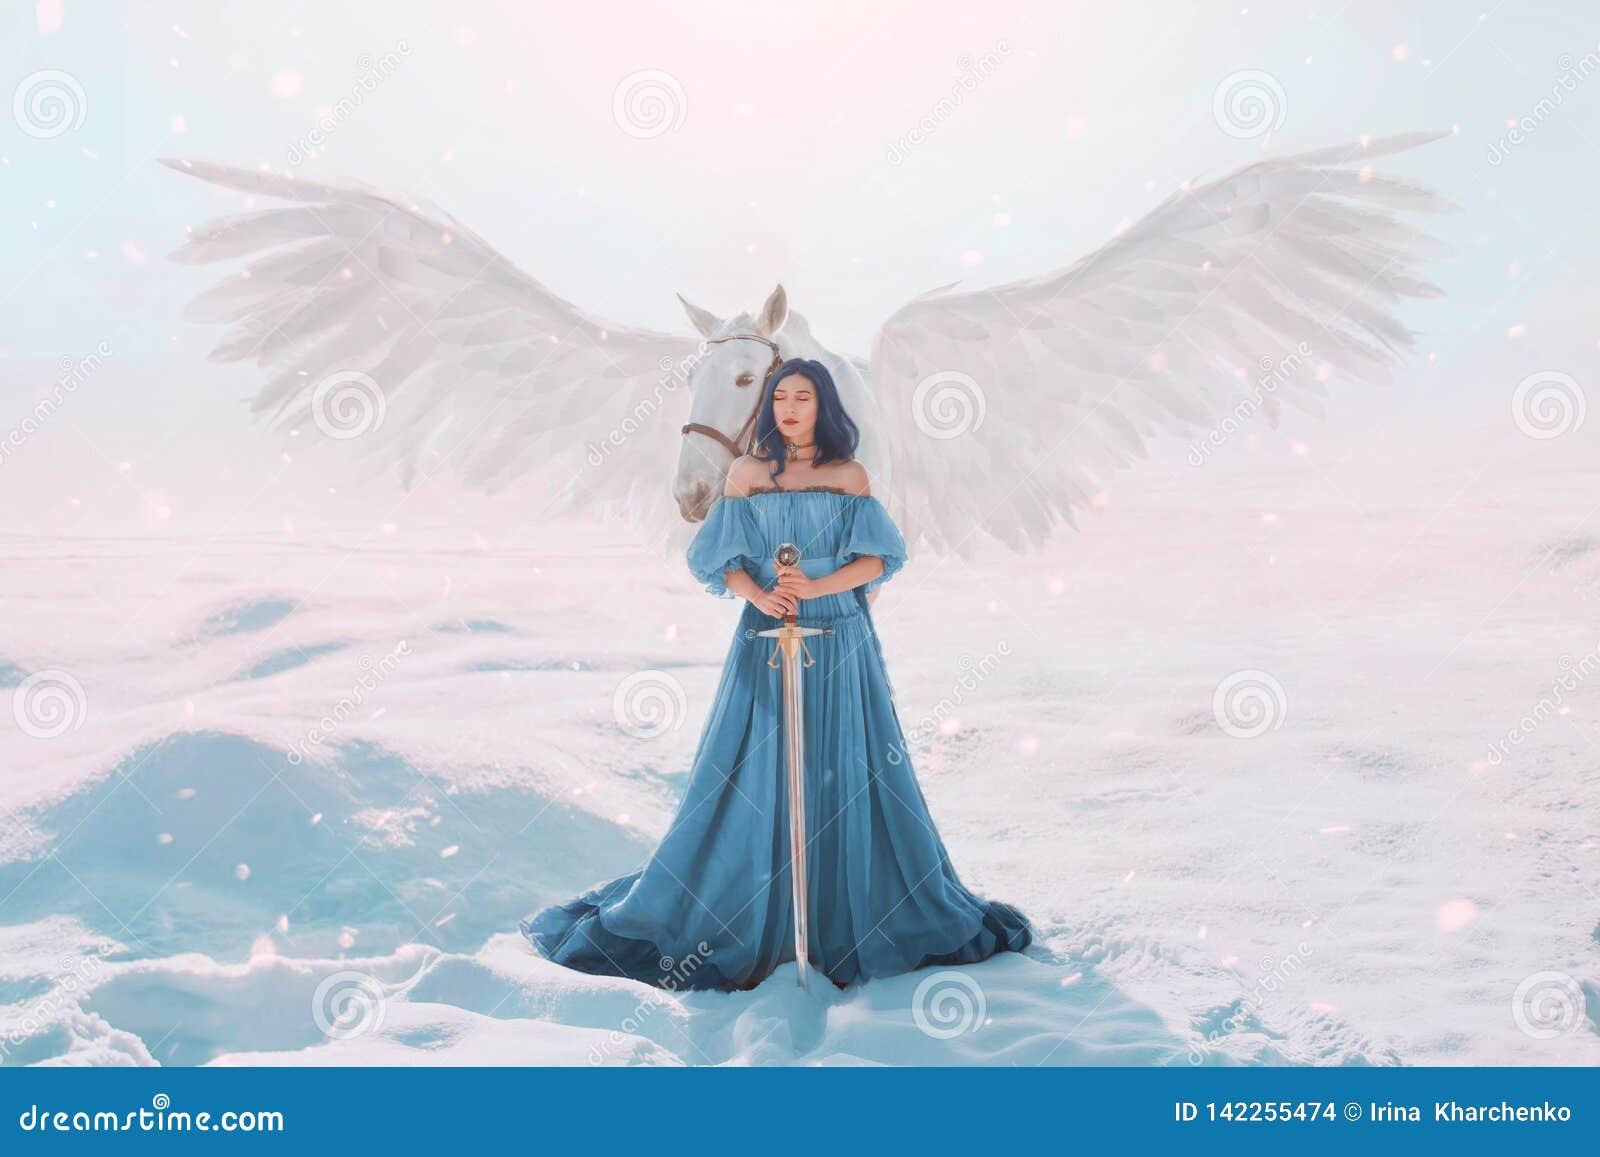 Dark Winter Fairy Standing with White Dragon Statue